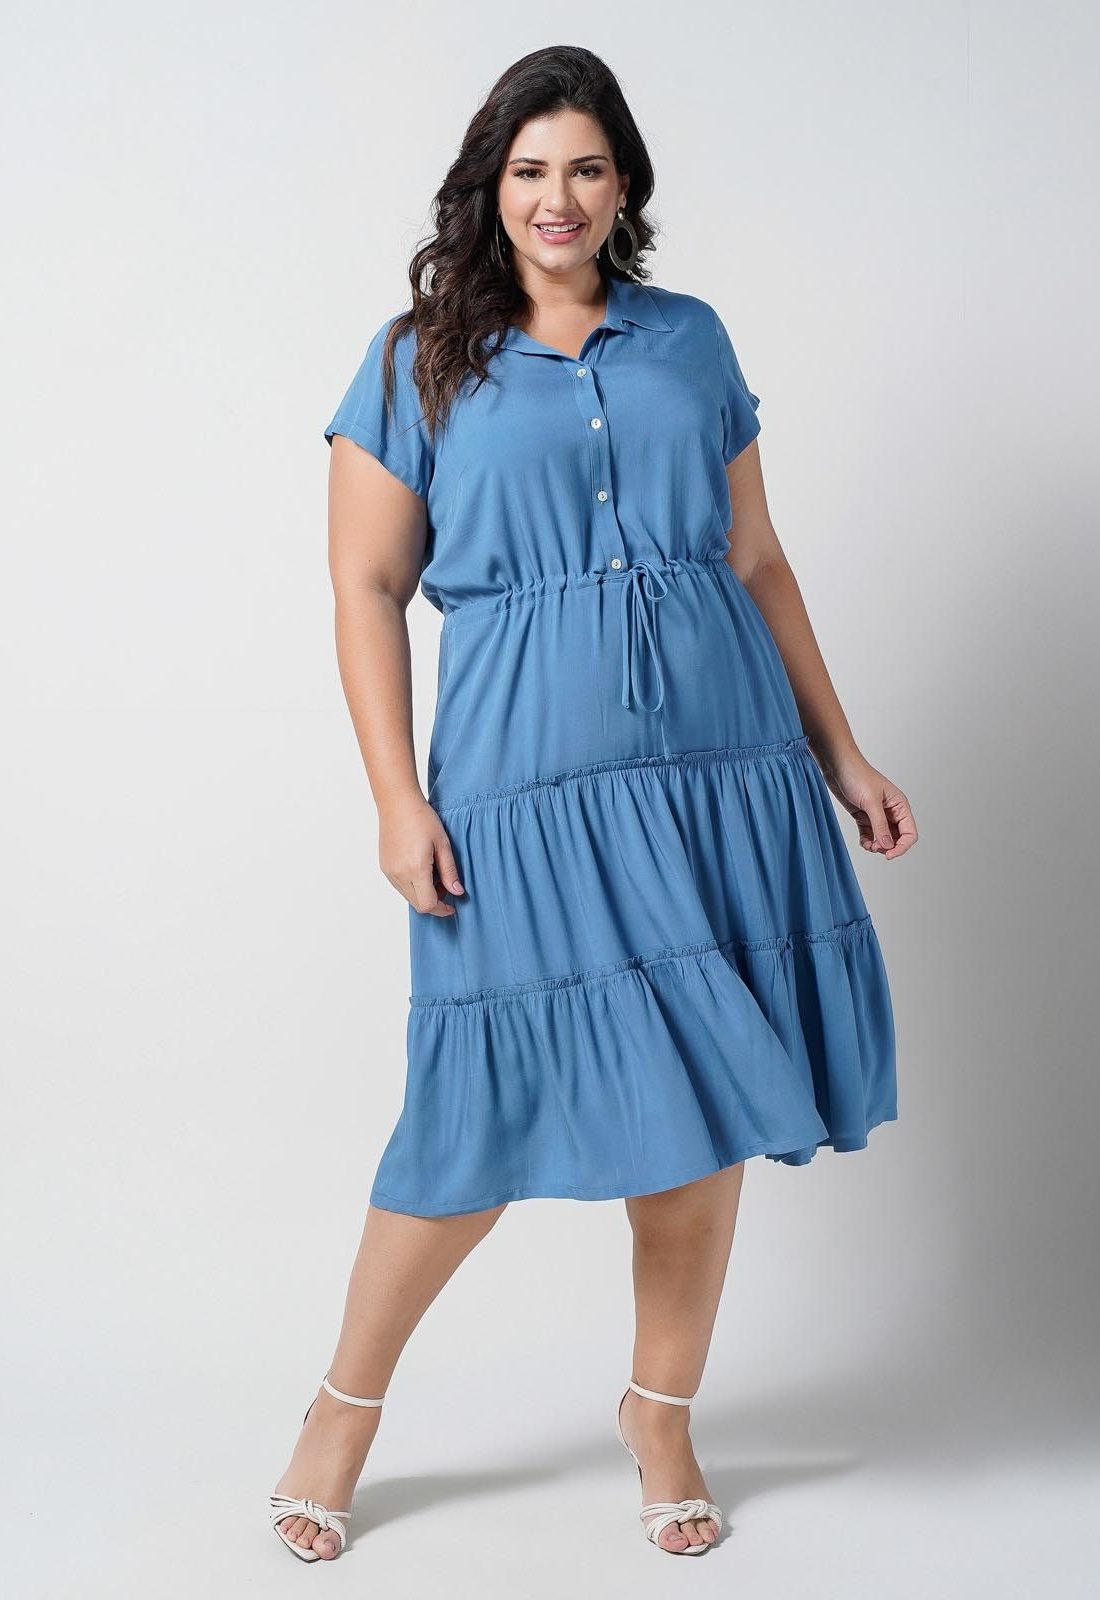 Vestido camadas com coulisse azul plus size  ref. U69921